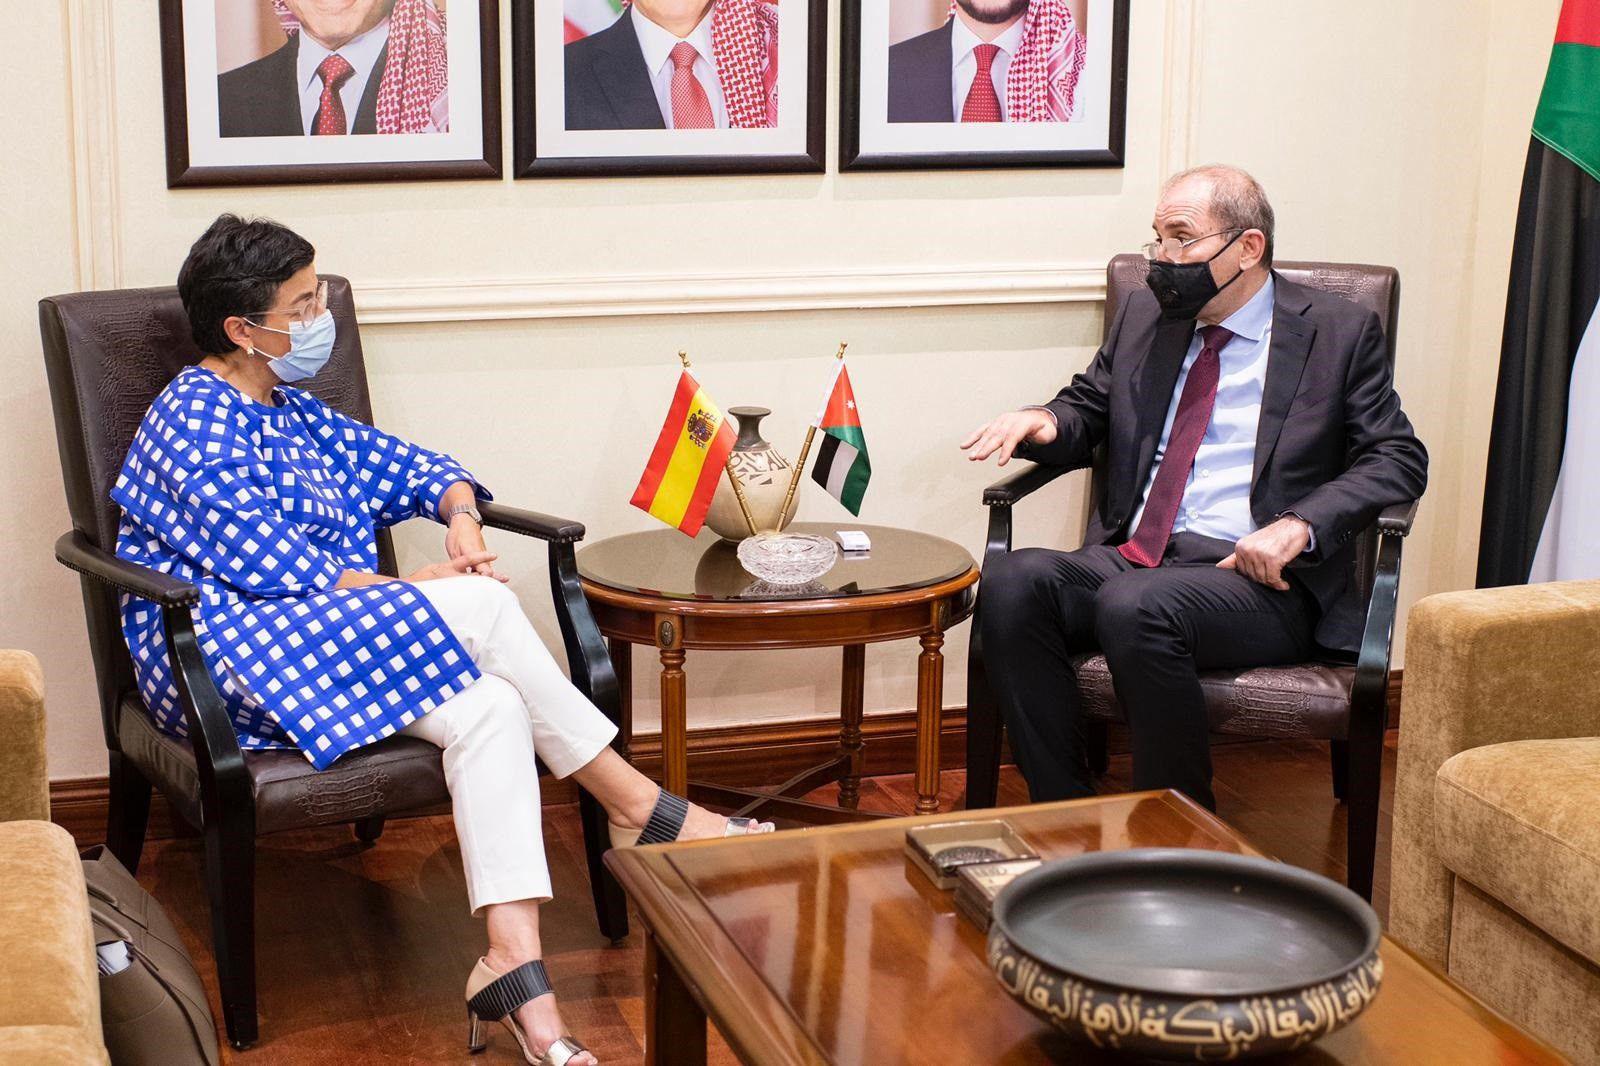 01/10/2020 La ministra de Asuntos Exteriores, UE y Cooperación, Arancha González Laya, se reúne en Ammán con su homólogo jordano, Ayman Safadi EUROPA ORIENTE PRÓXIMO ASIA ESPAÑA JORDANIA POLÍTICA TWITTER MINISTERIO DE ASUNTOS EXTERIORES